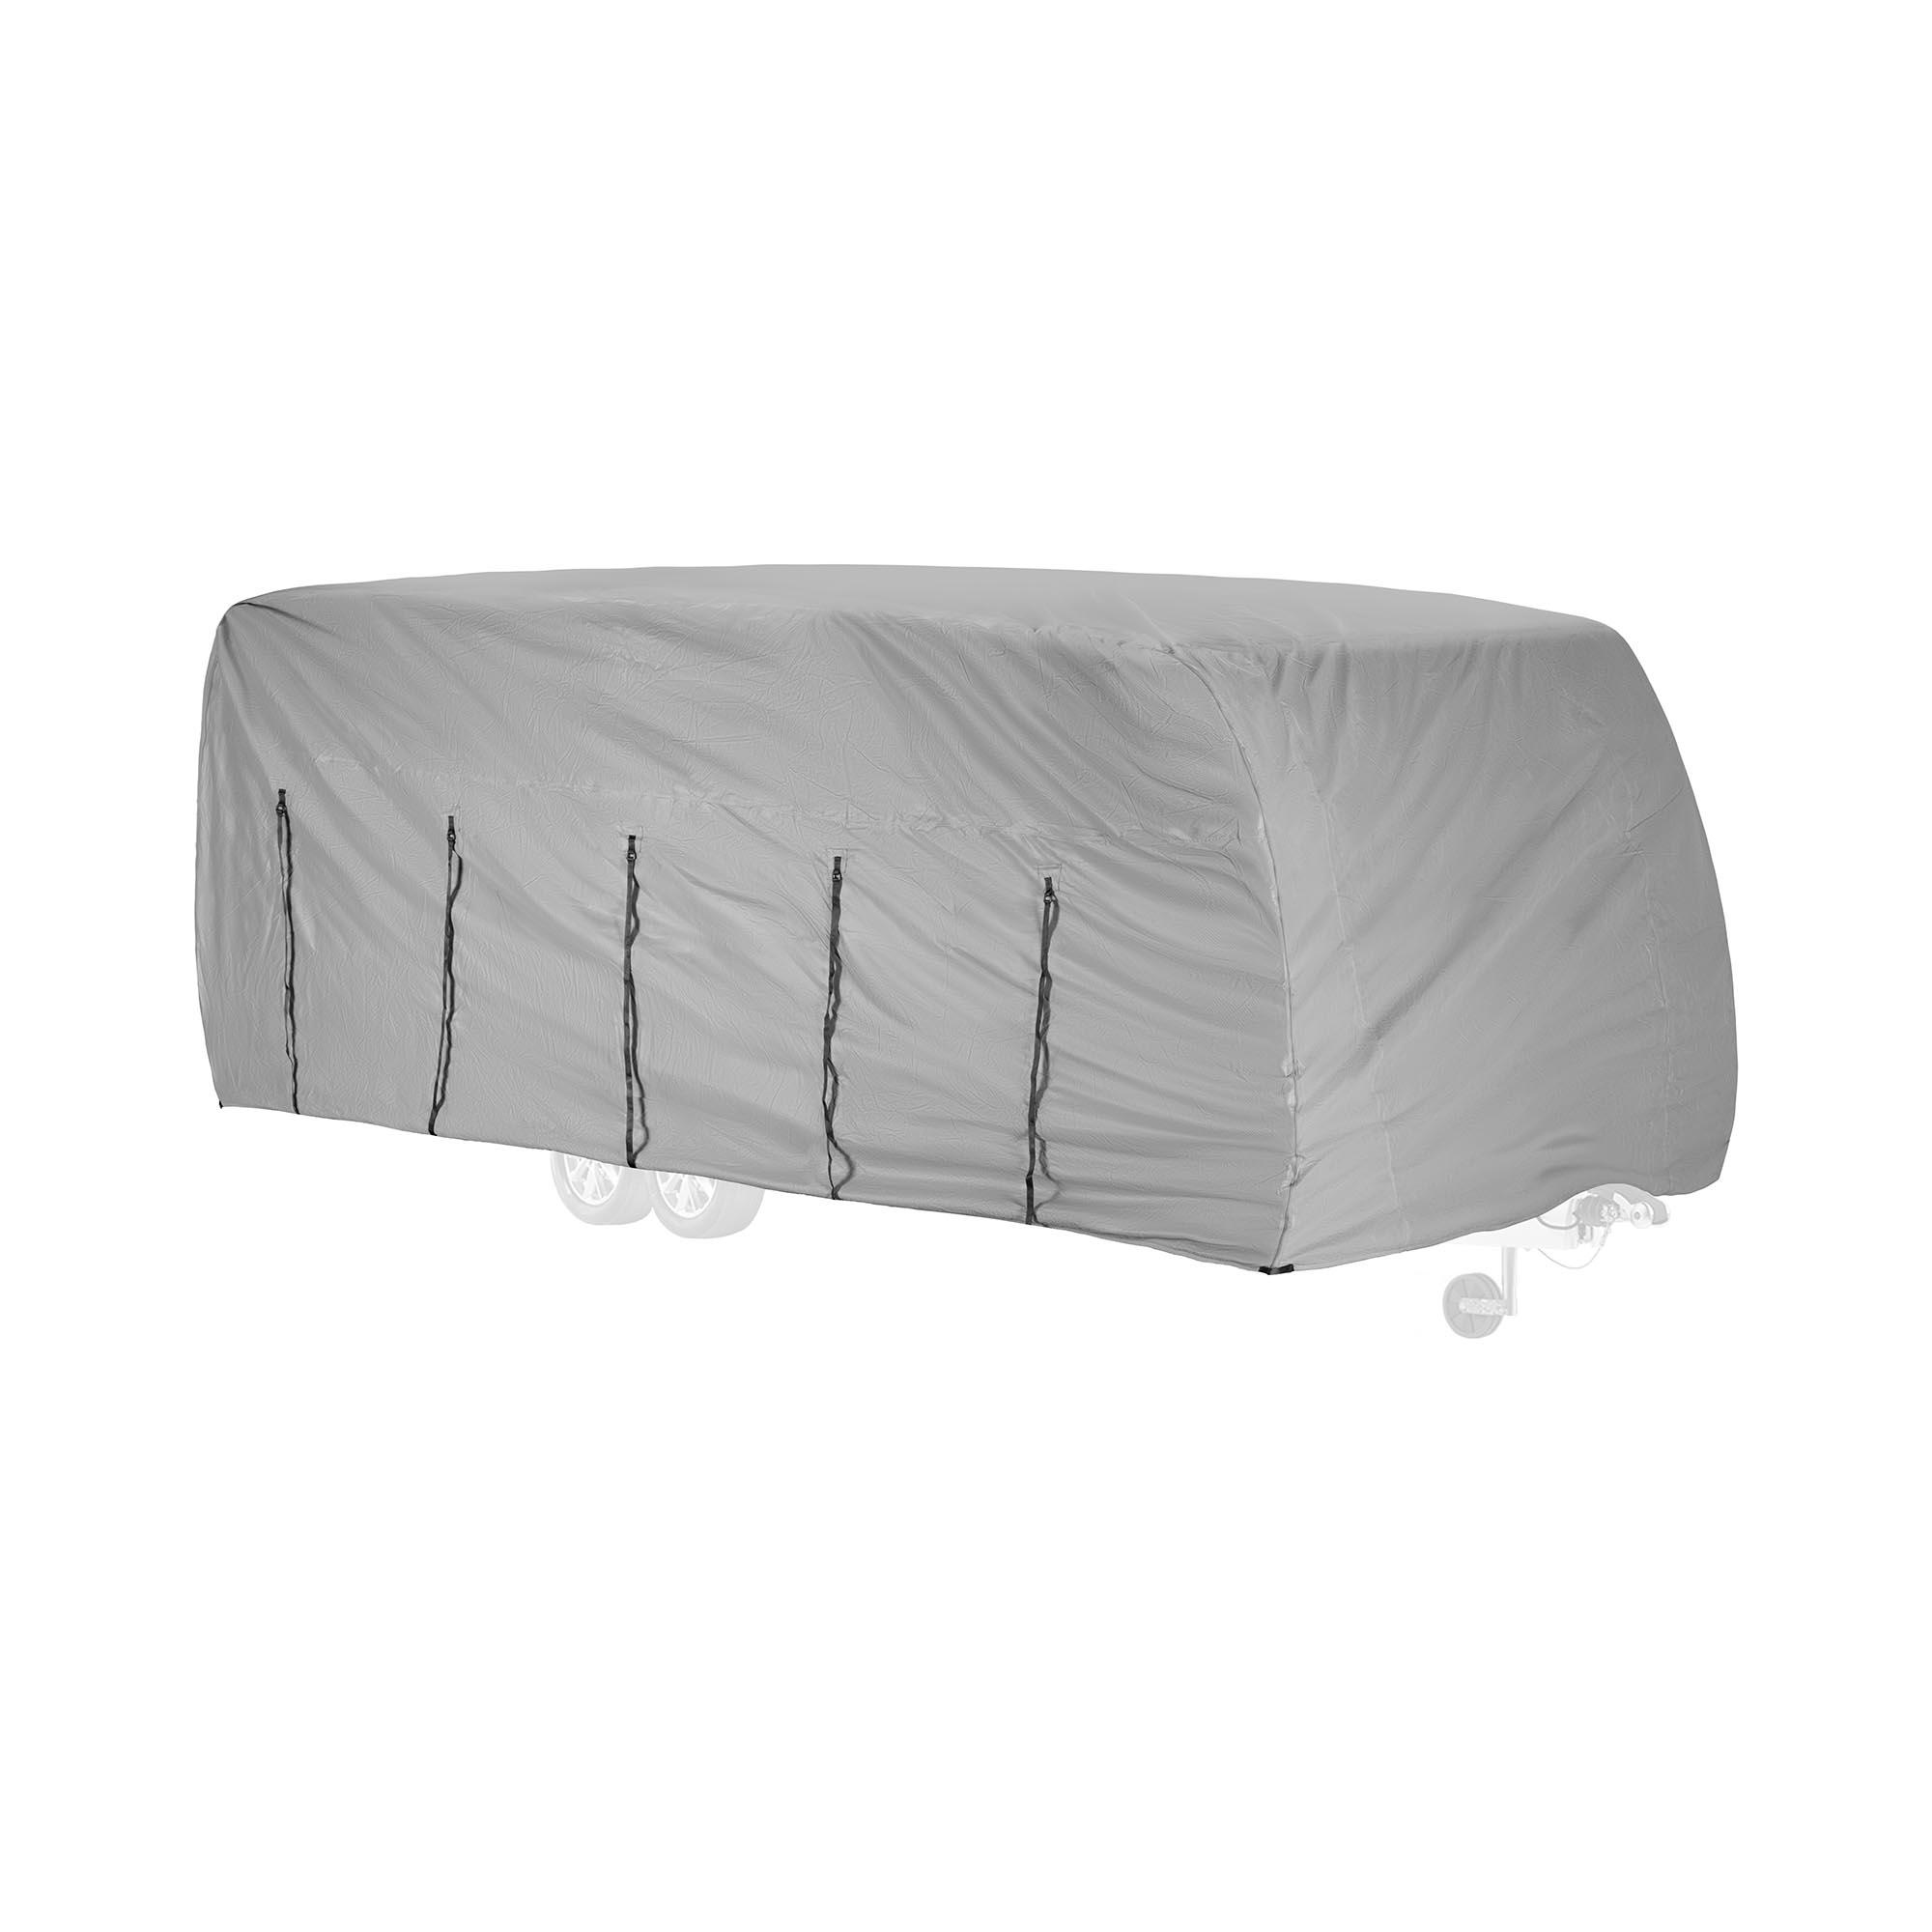 MSW Wohnmobil Schutzhülle - 700 x 220 x 250 cm MSW-CC-700-130